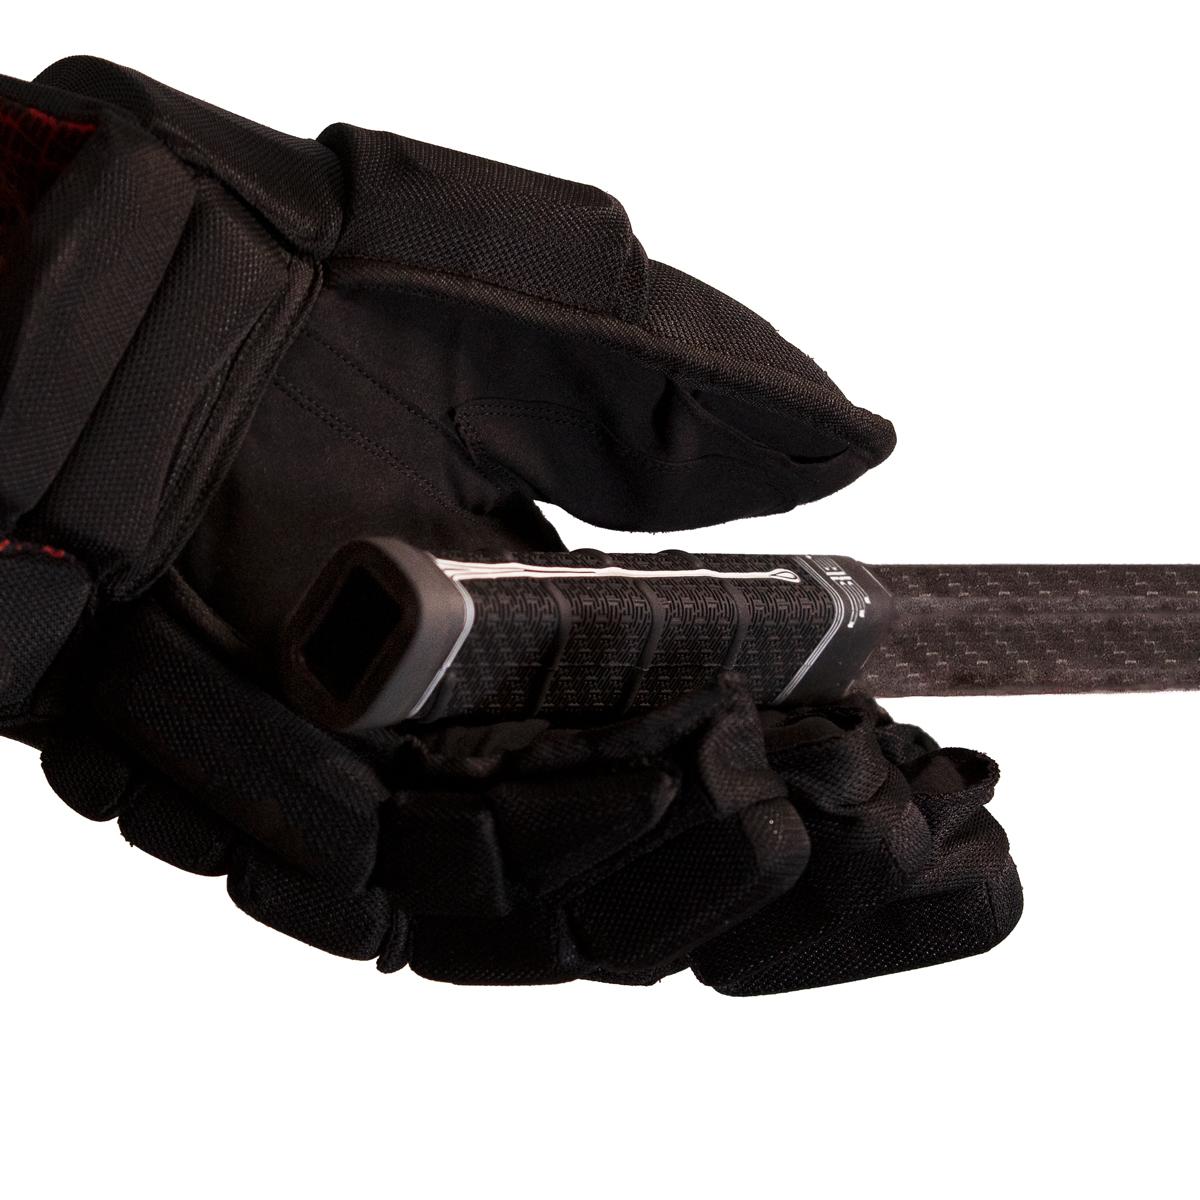 BUTT-Future-Black-Glove-Hold-WHITE-WEB.jpg